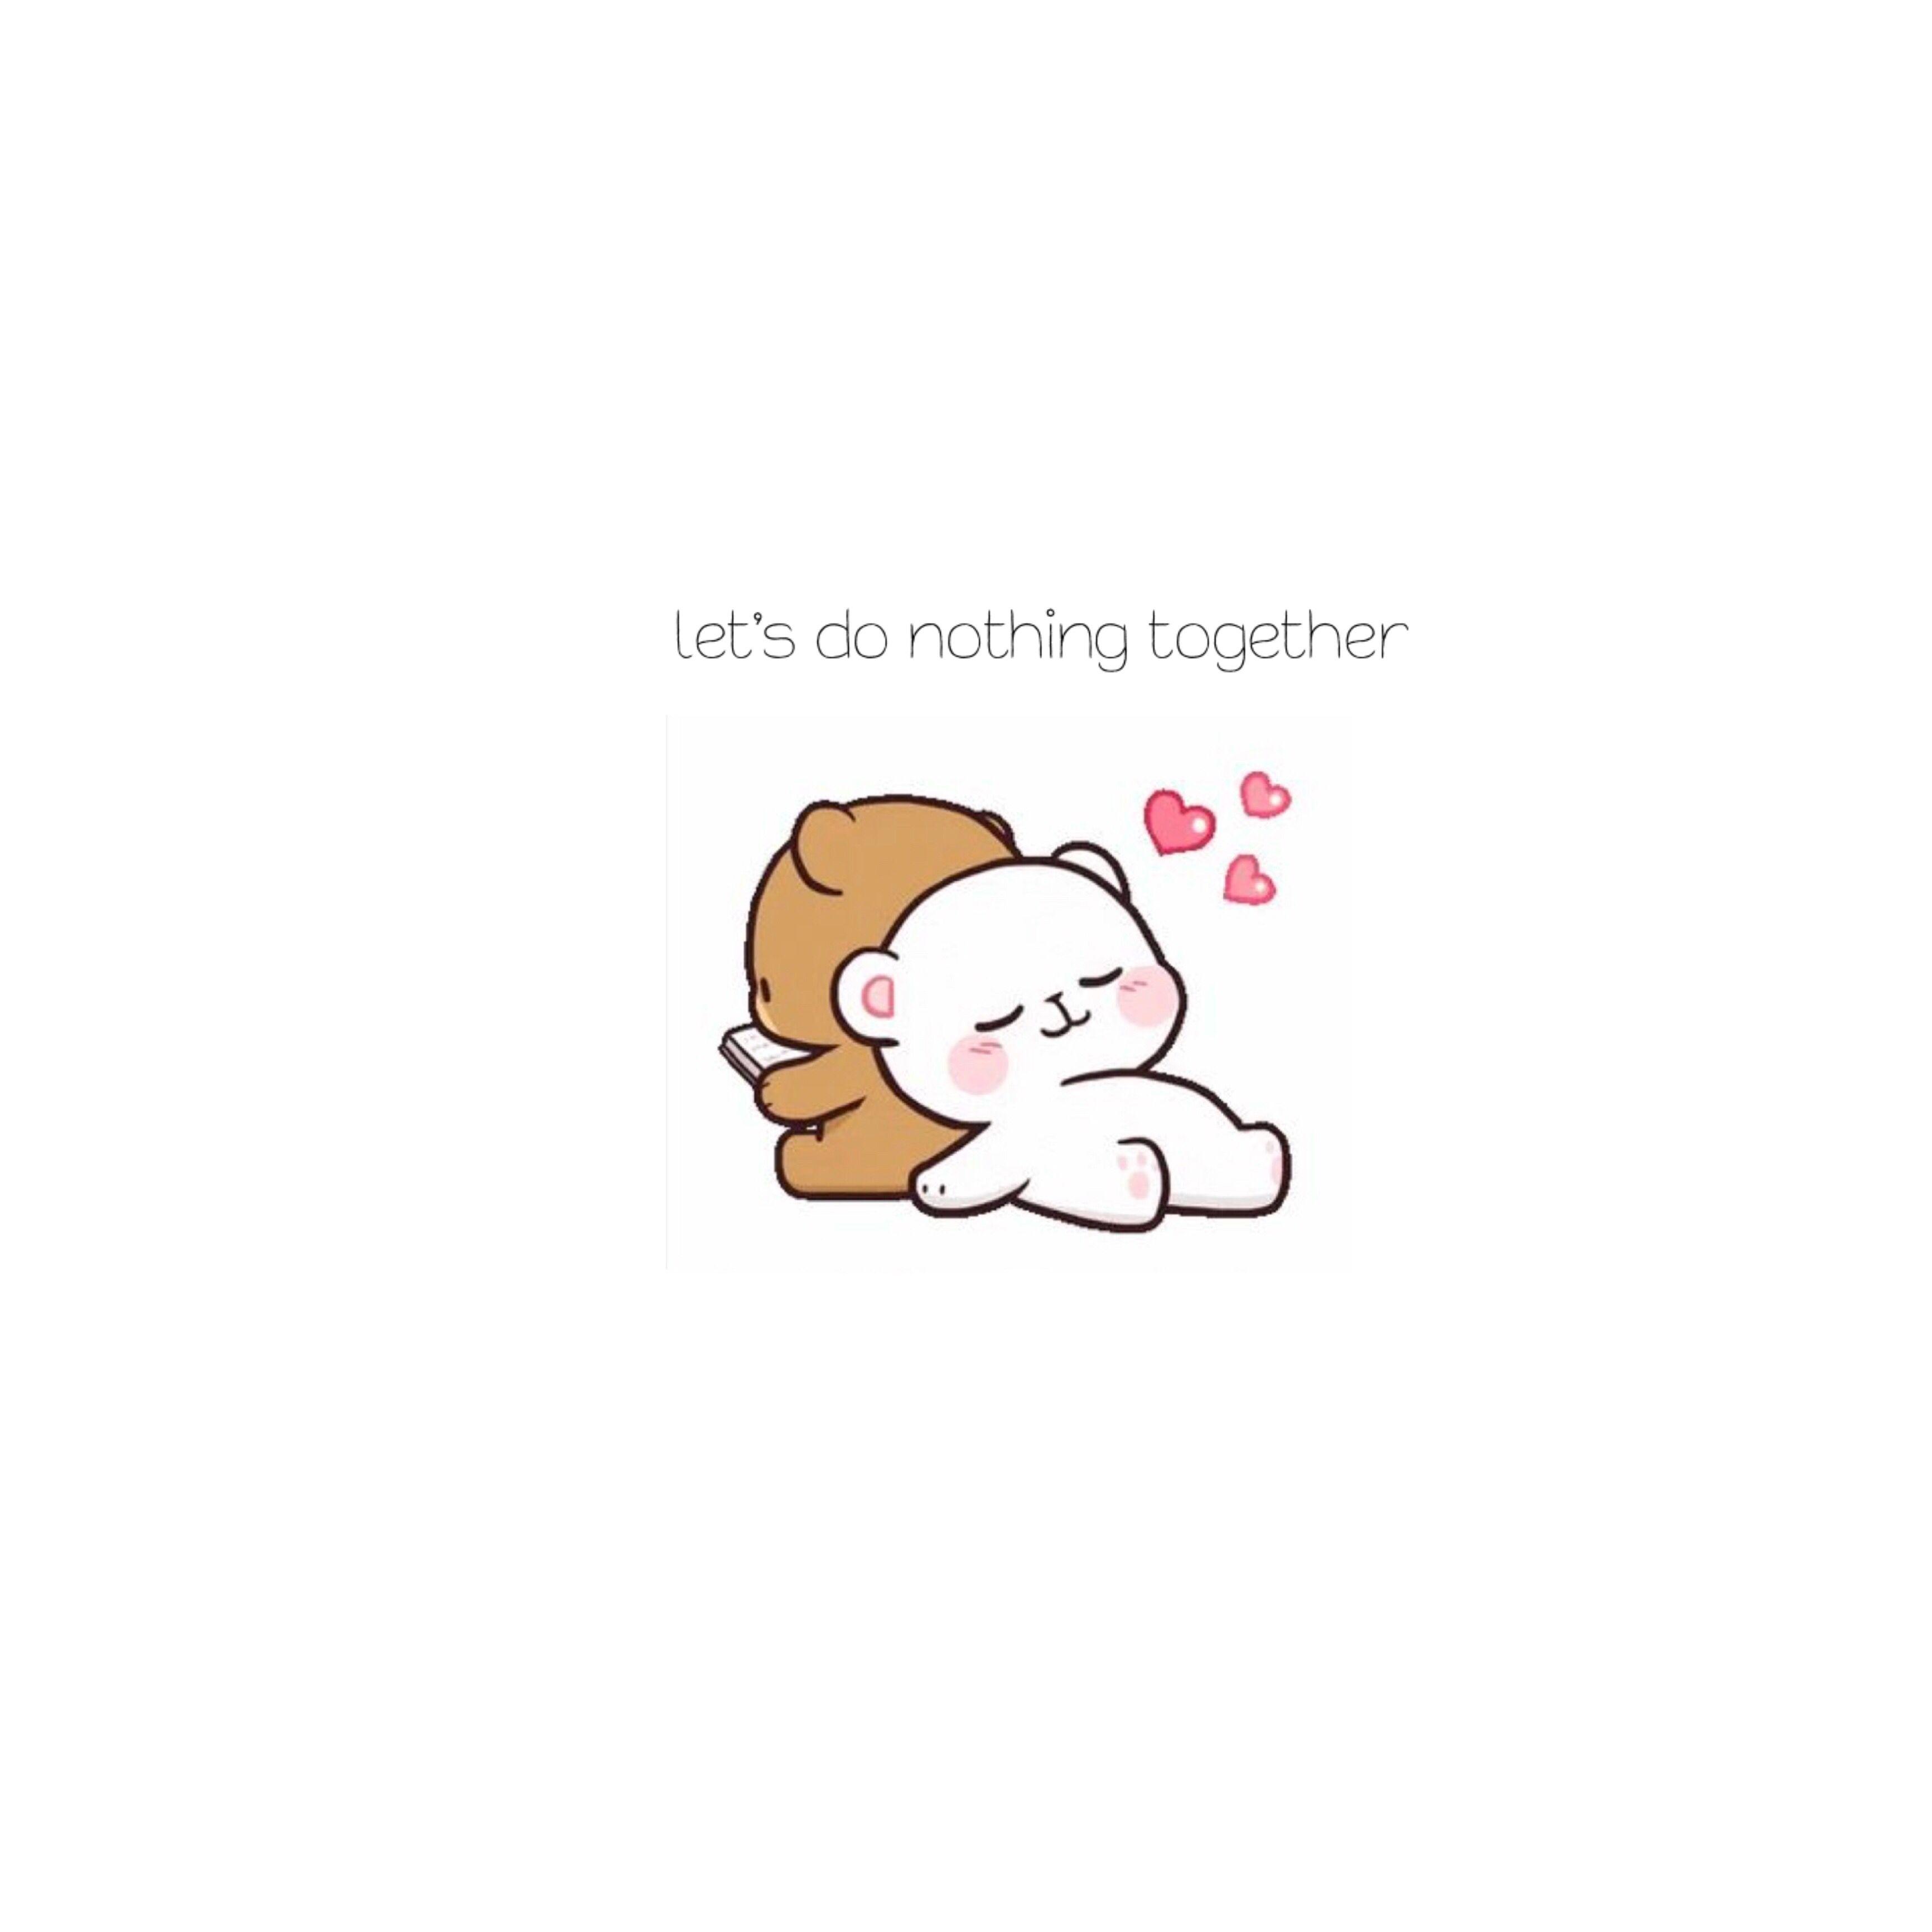 Cute Funny Quotes Lovely Inspirational Words Cute Love Cartoons Cute Bear Drawings Cute Couple Cartoon